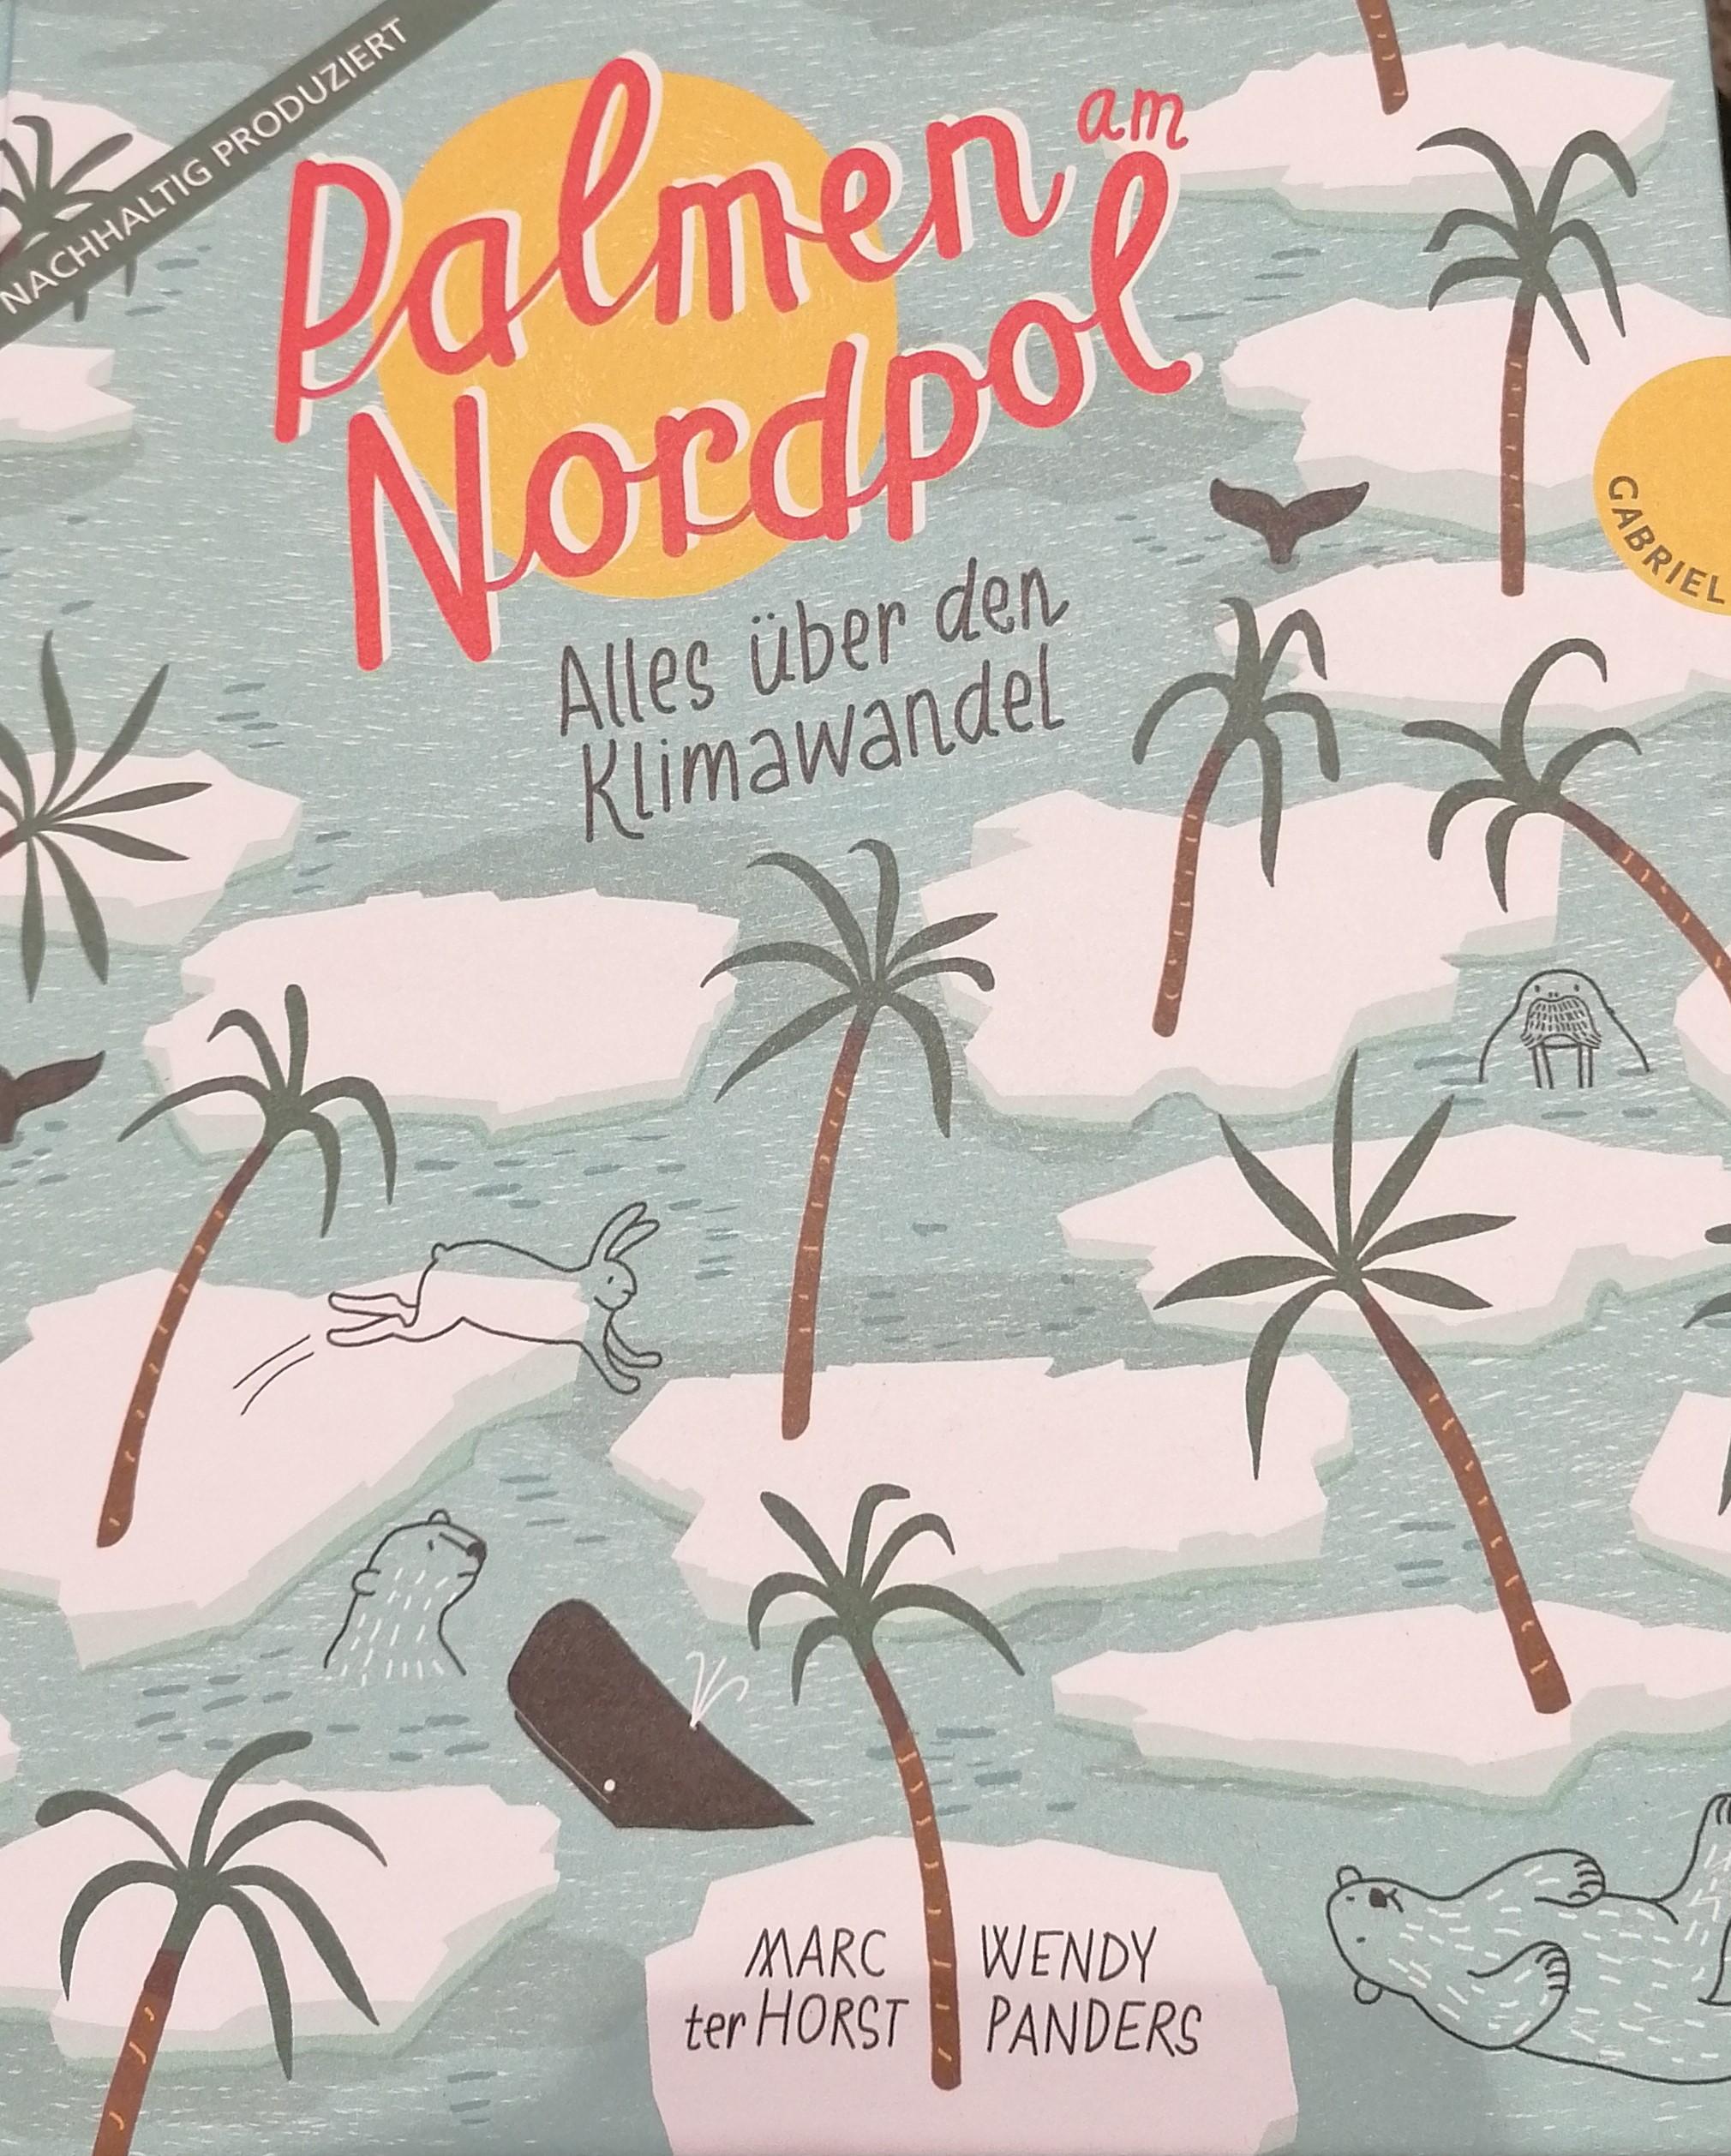 Palmen am Nordpol Book Cover